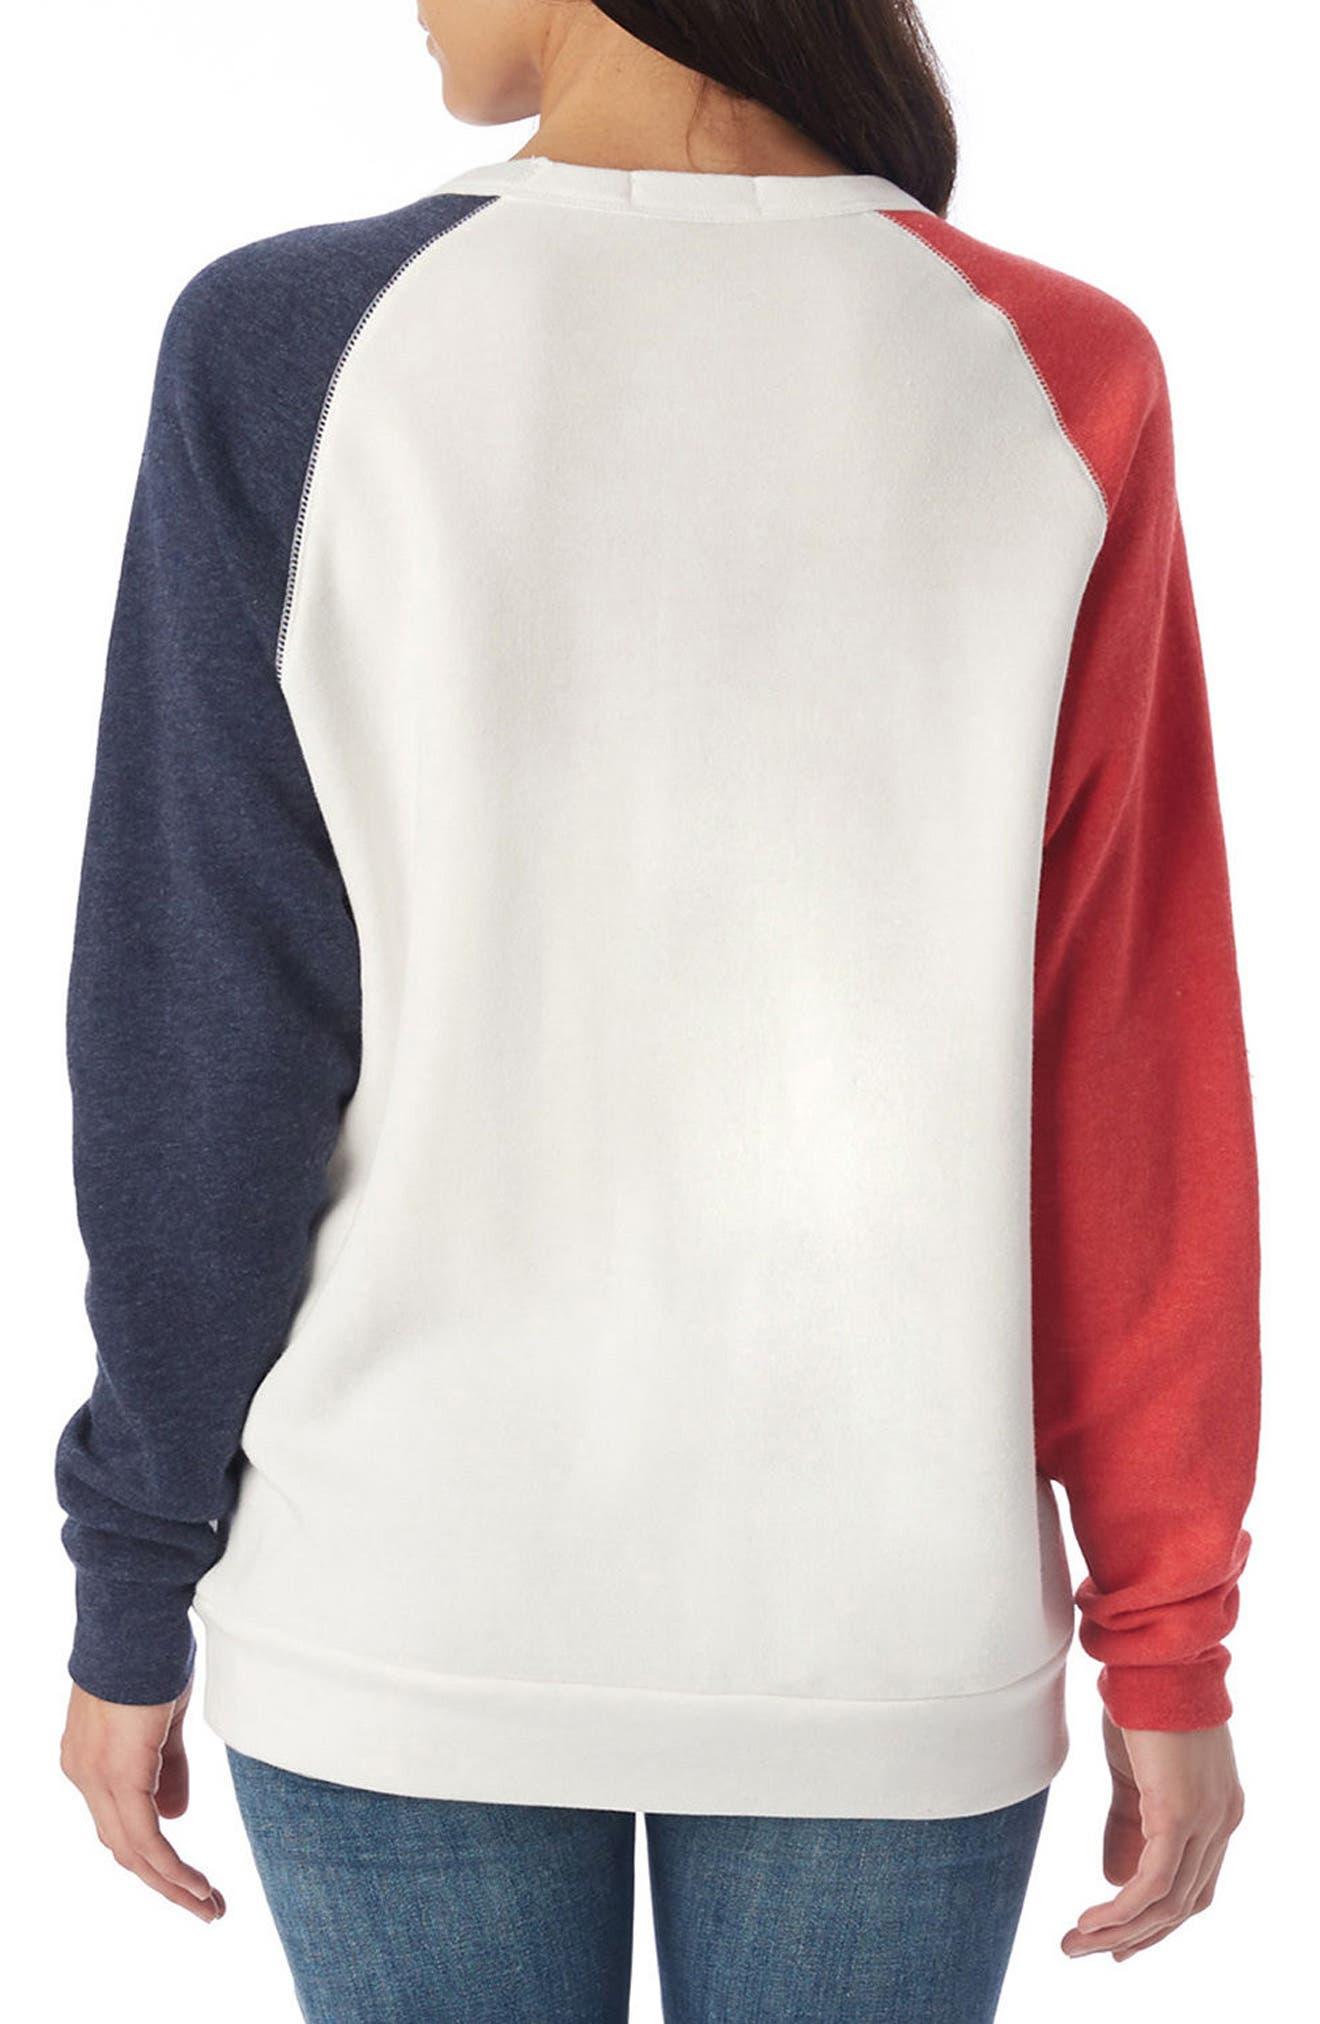 USA Champ Sweatshirt,                             Alternate thumbnail 2, color,                             Ivory/ True Red/ True Navy